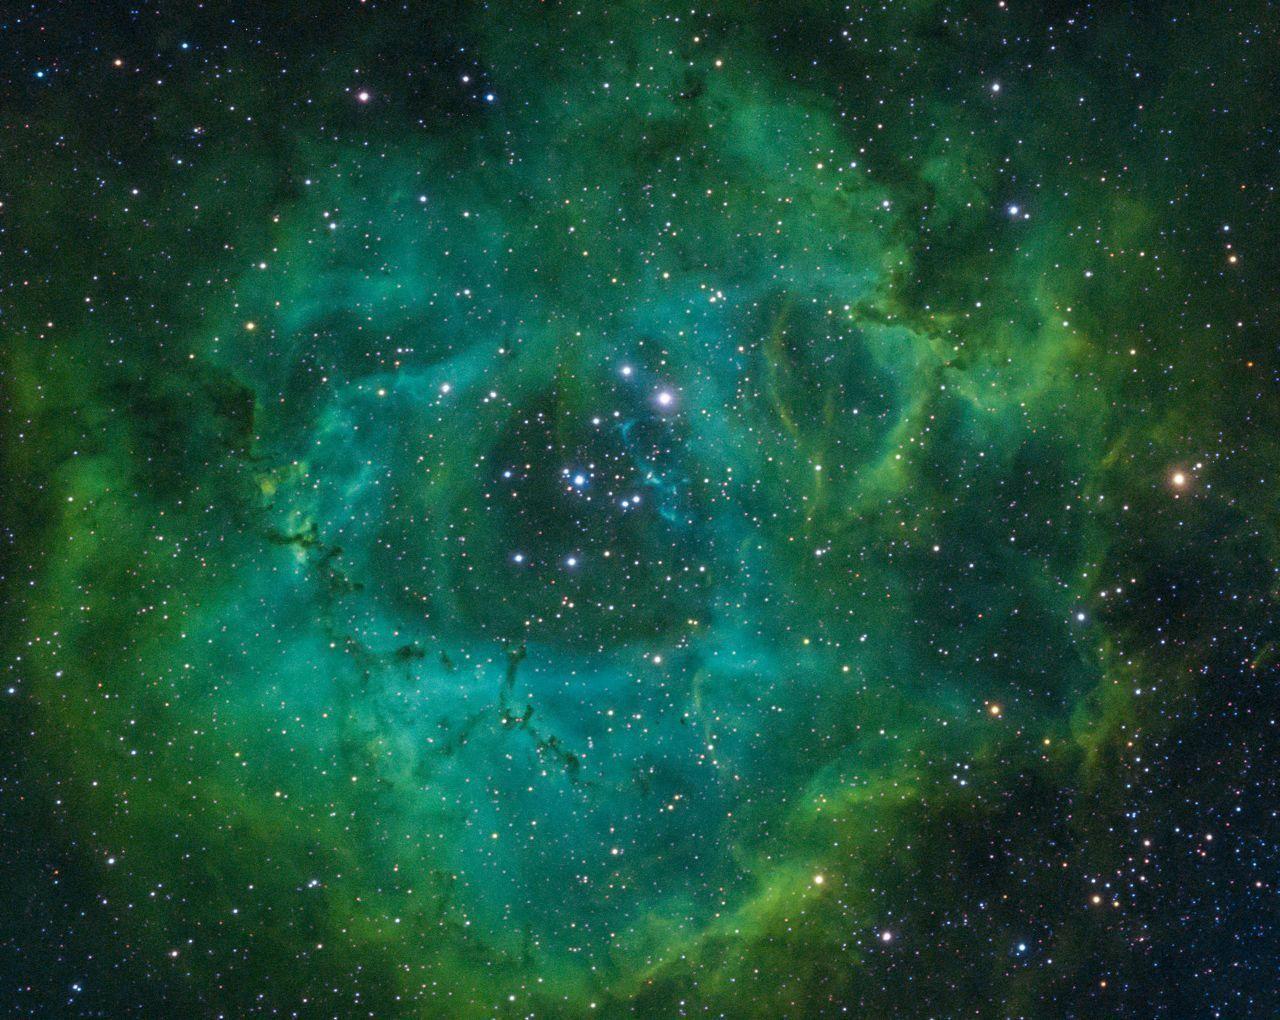 Green Galaxy Space Aesthetic Dark Green Aesthetic Marvel Wall Art Aesthetic Space